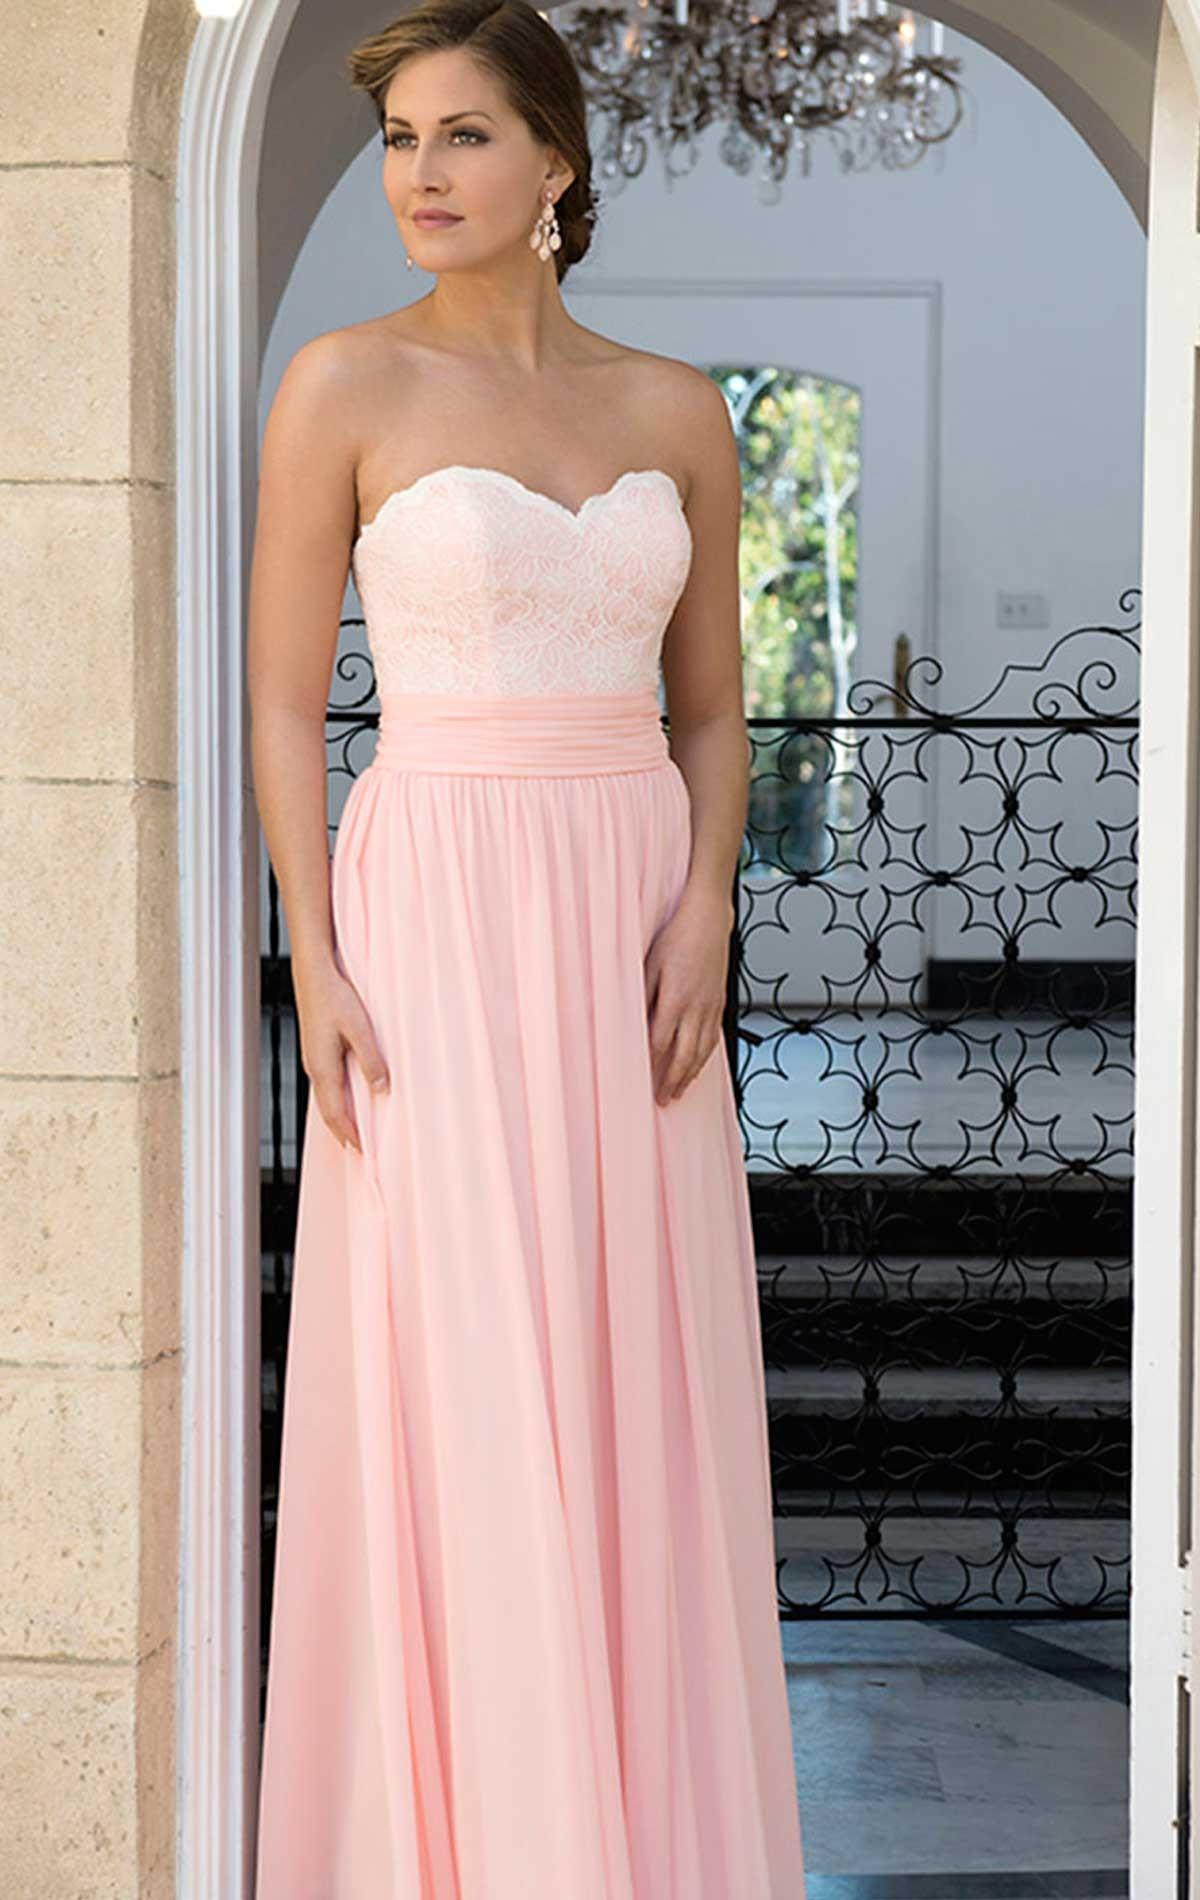 Chiffon & Lace Bridesmaid Dress | Blessings of Brighton